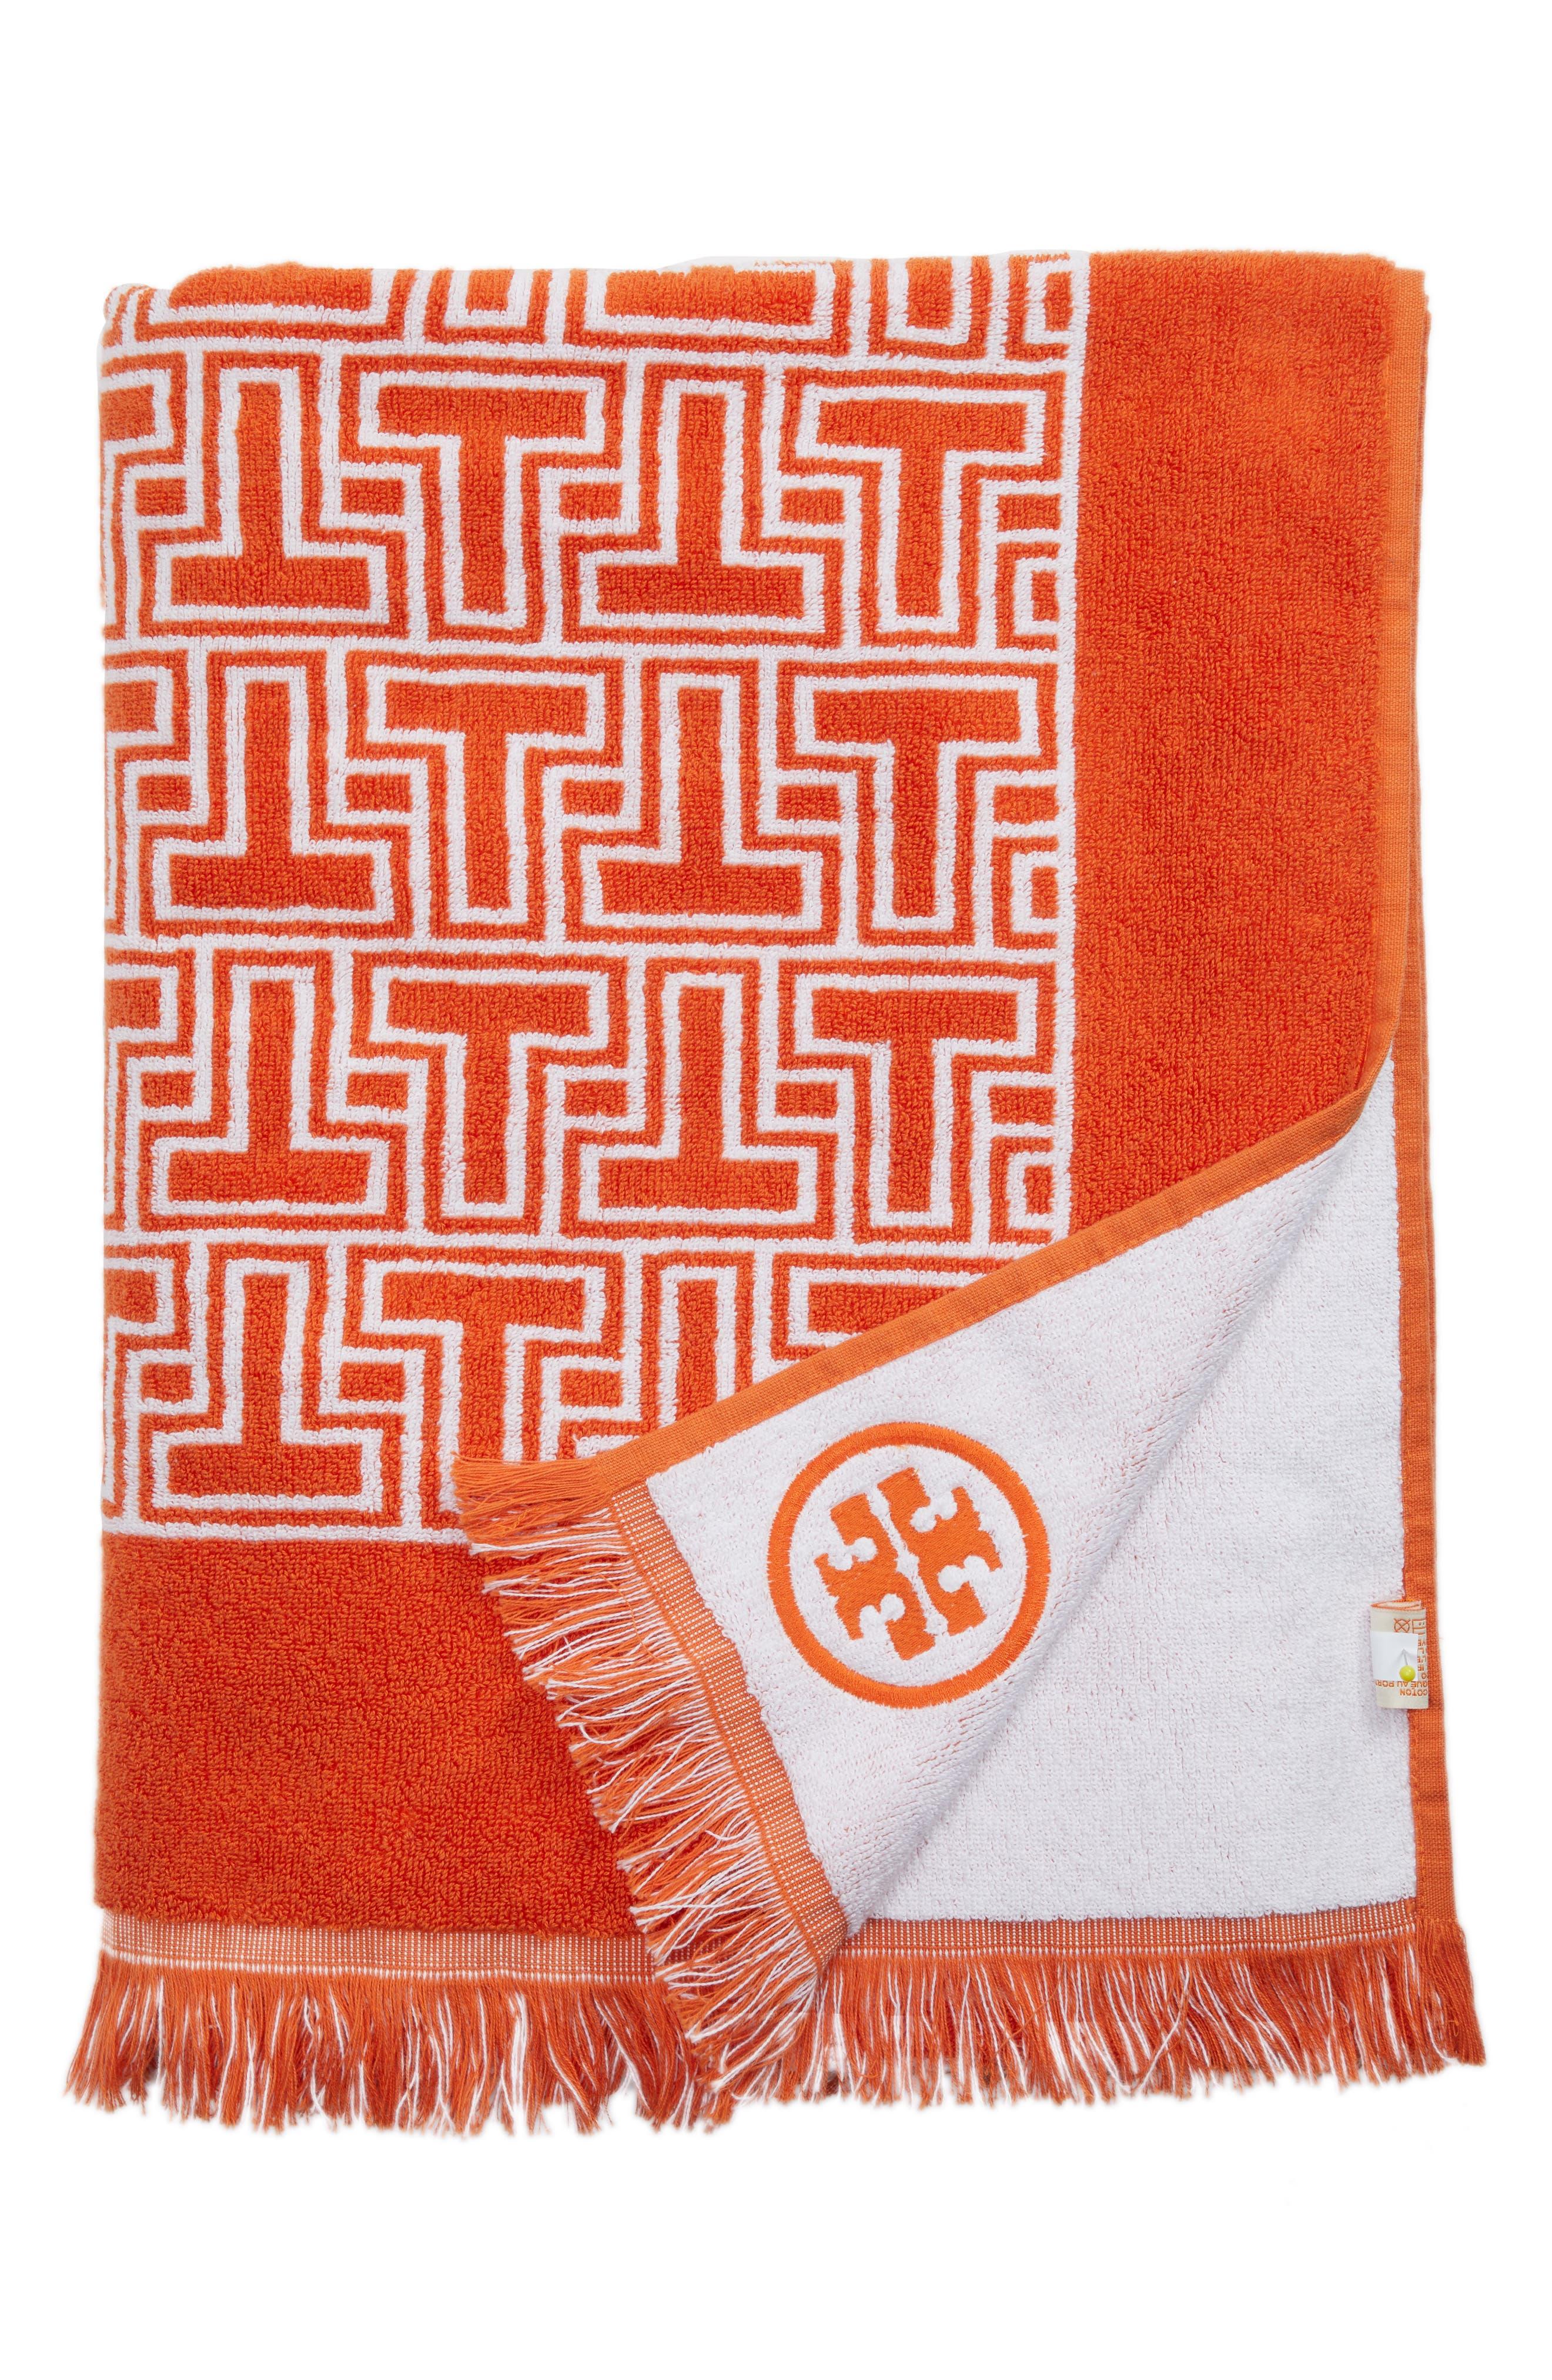 Tory Burch T-Tiles Beach Towel